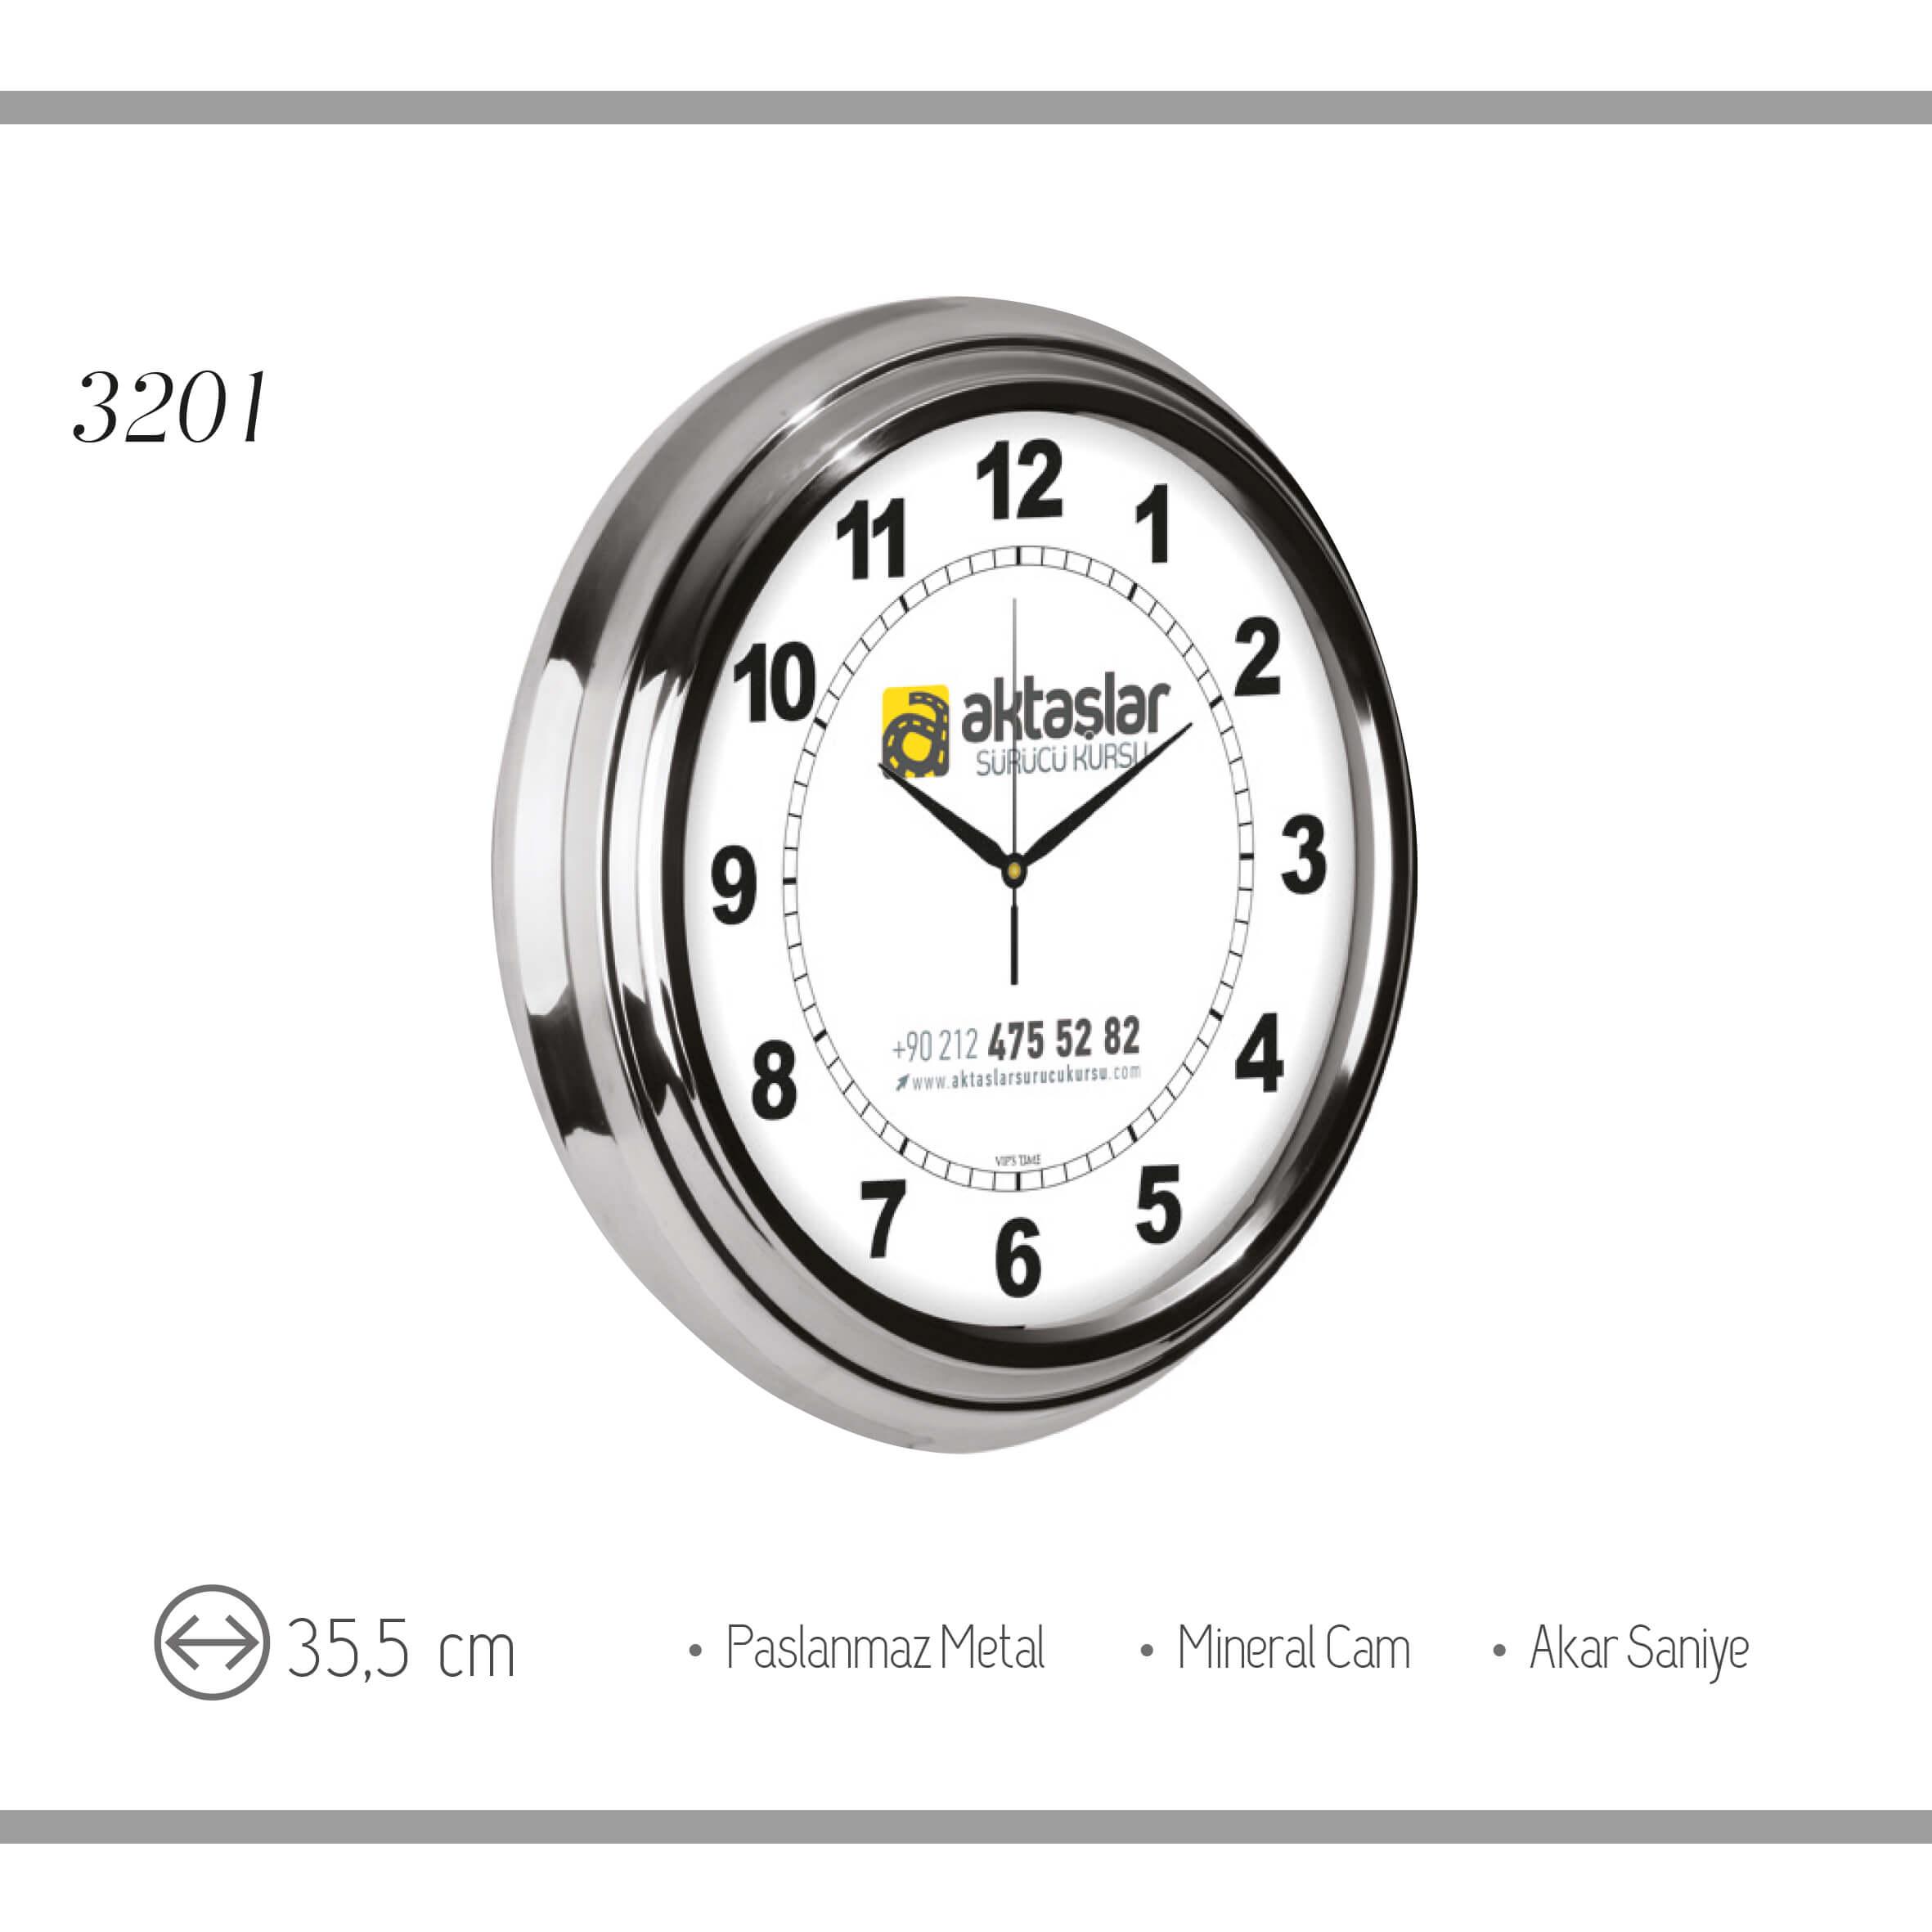 promosyon-promosyon ürünleri-promosyon saatler-duvar saatleri-promosyon duvar saati 3201